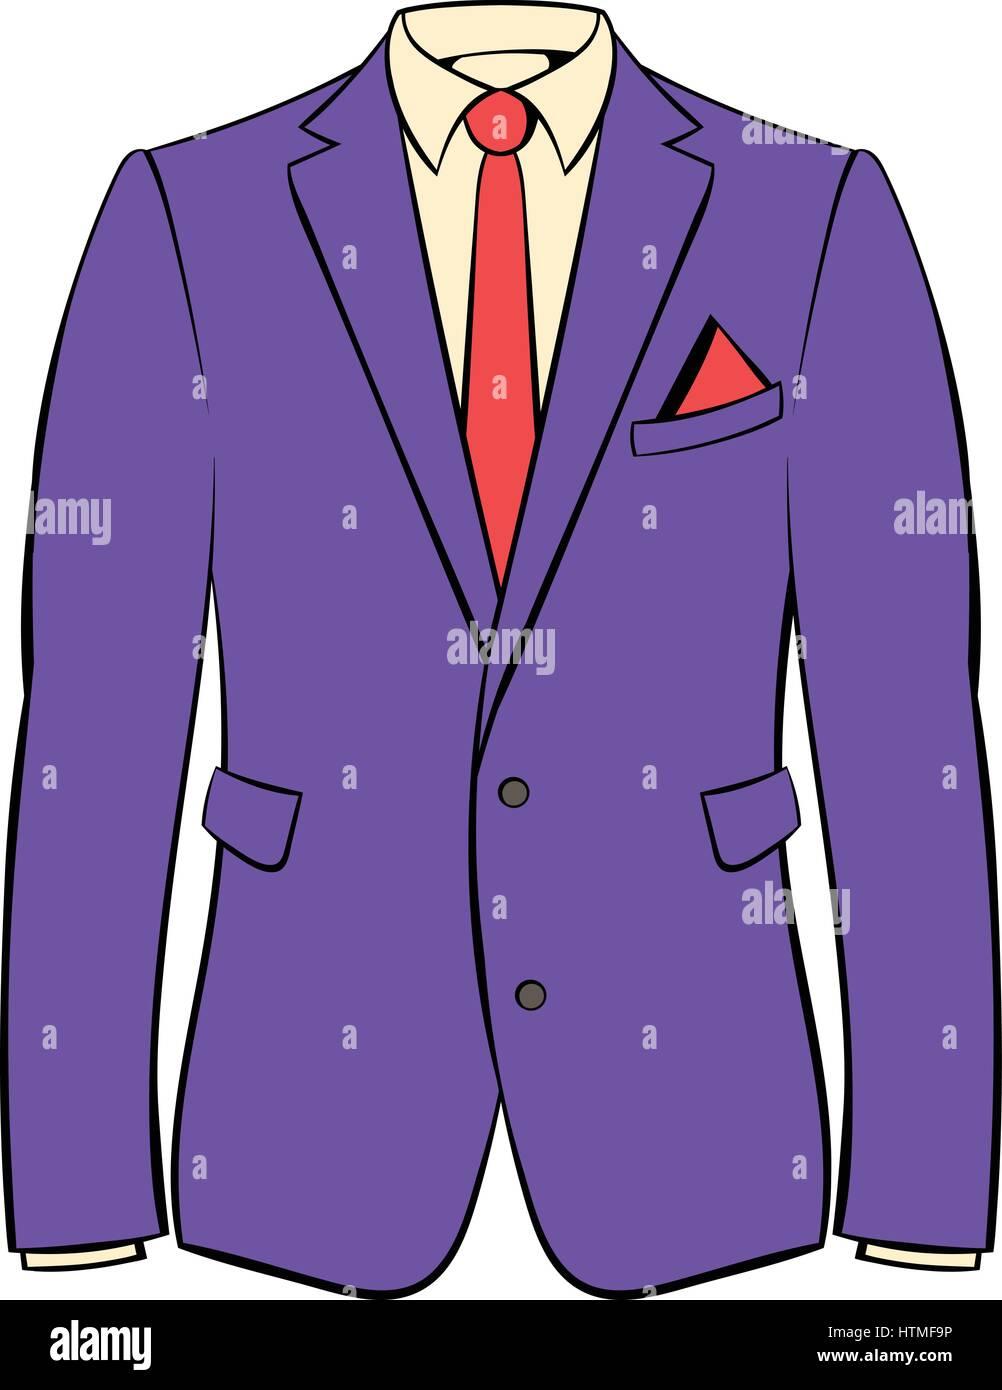 Herren Mit Abbildung Symbol Vektor Jacke Hemd Bild Cartoon MVGUzqpS